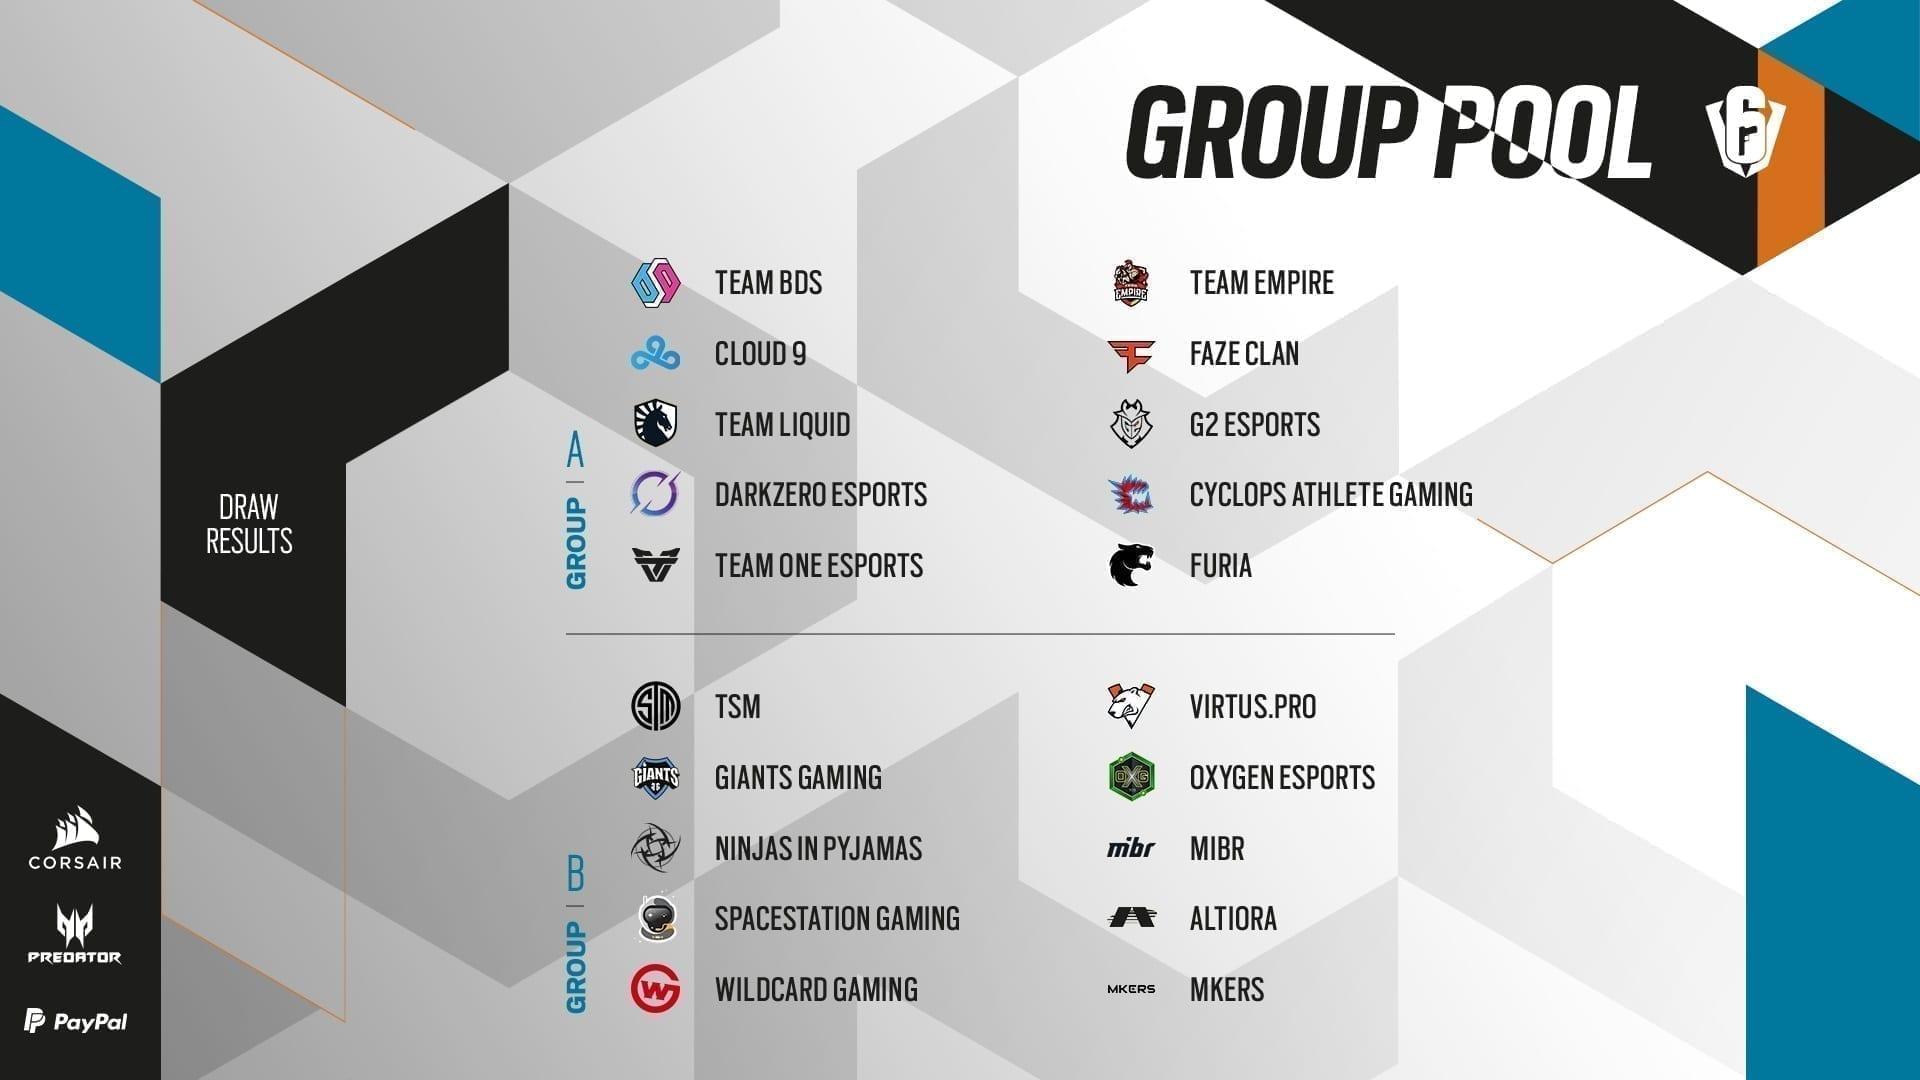 Six Invitational 2021 Group Pool